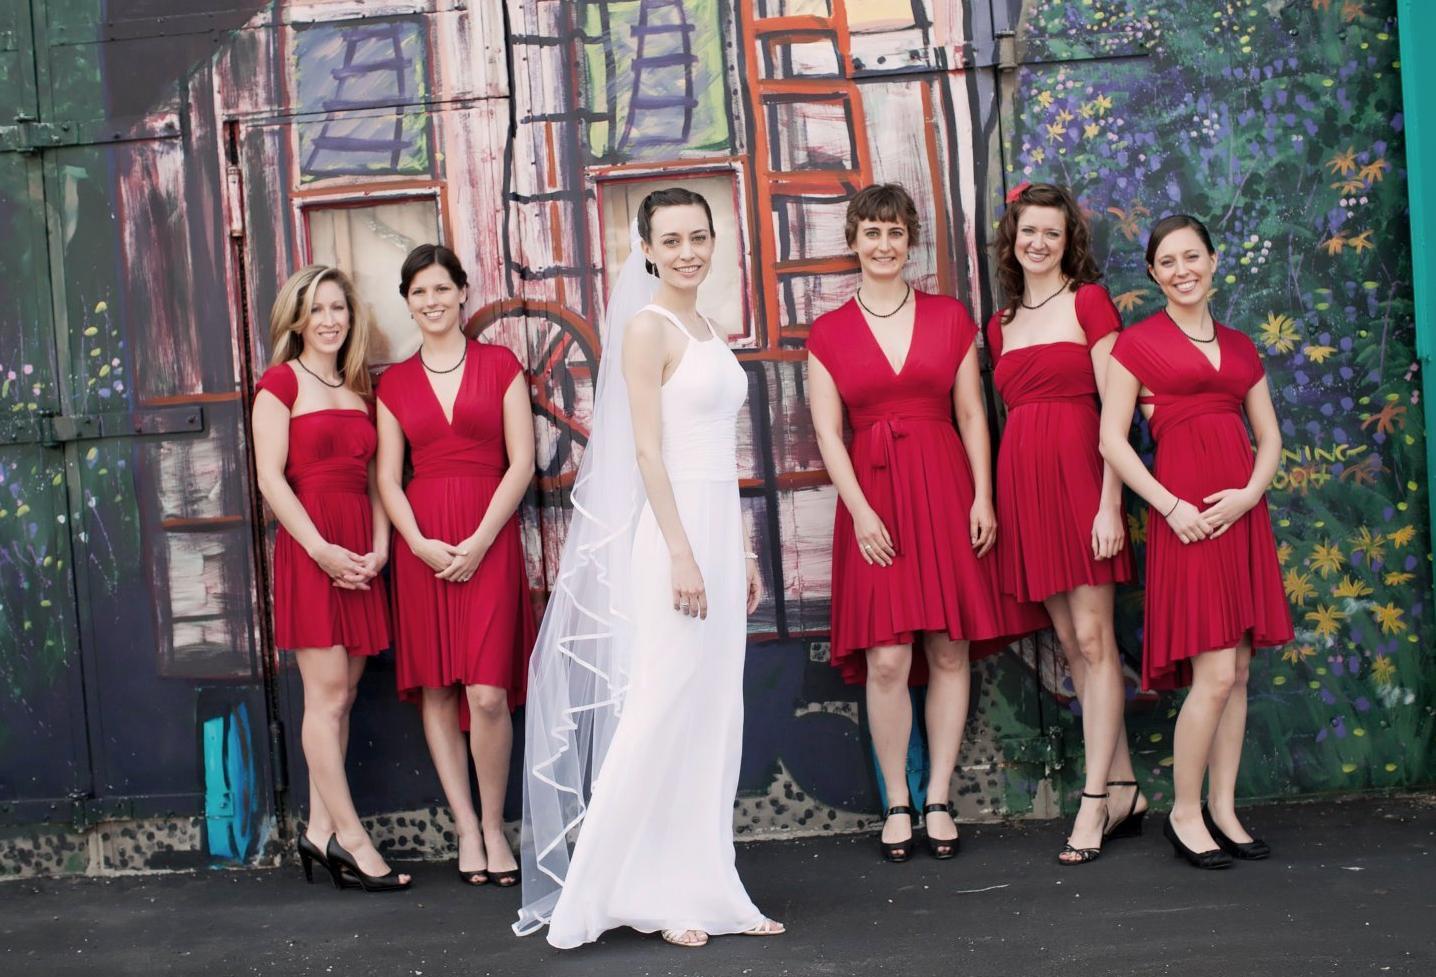 convertible bridesmaids dresses bridal party style